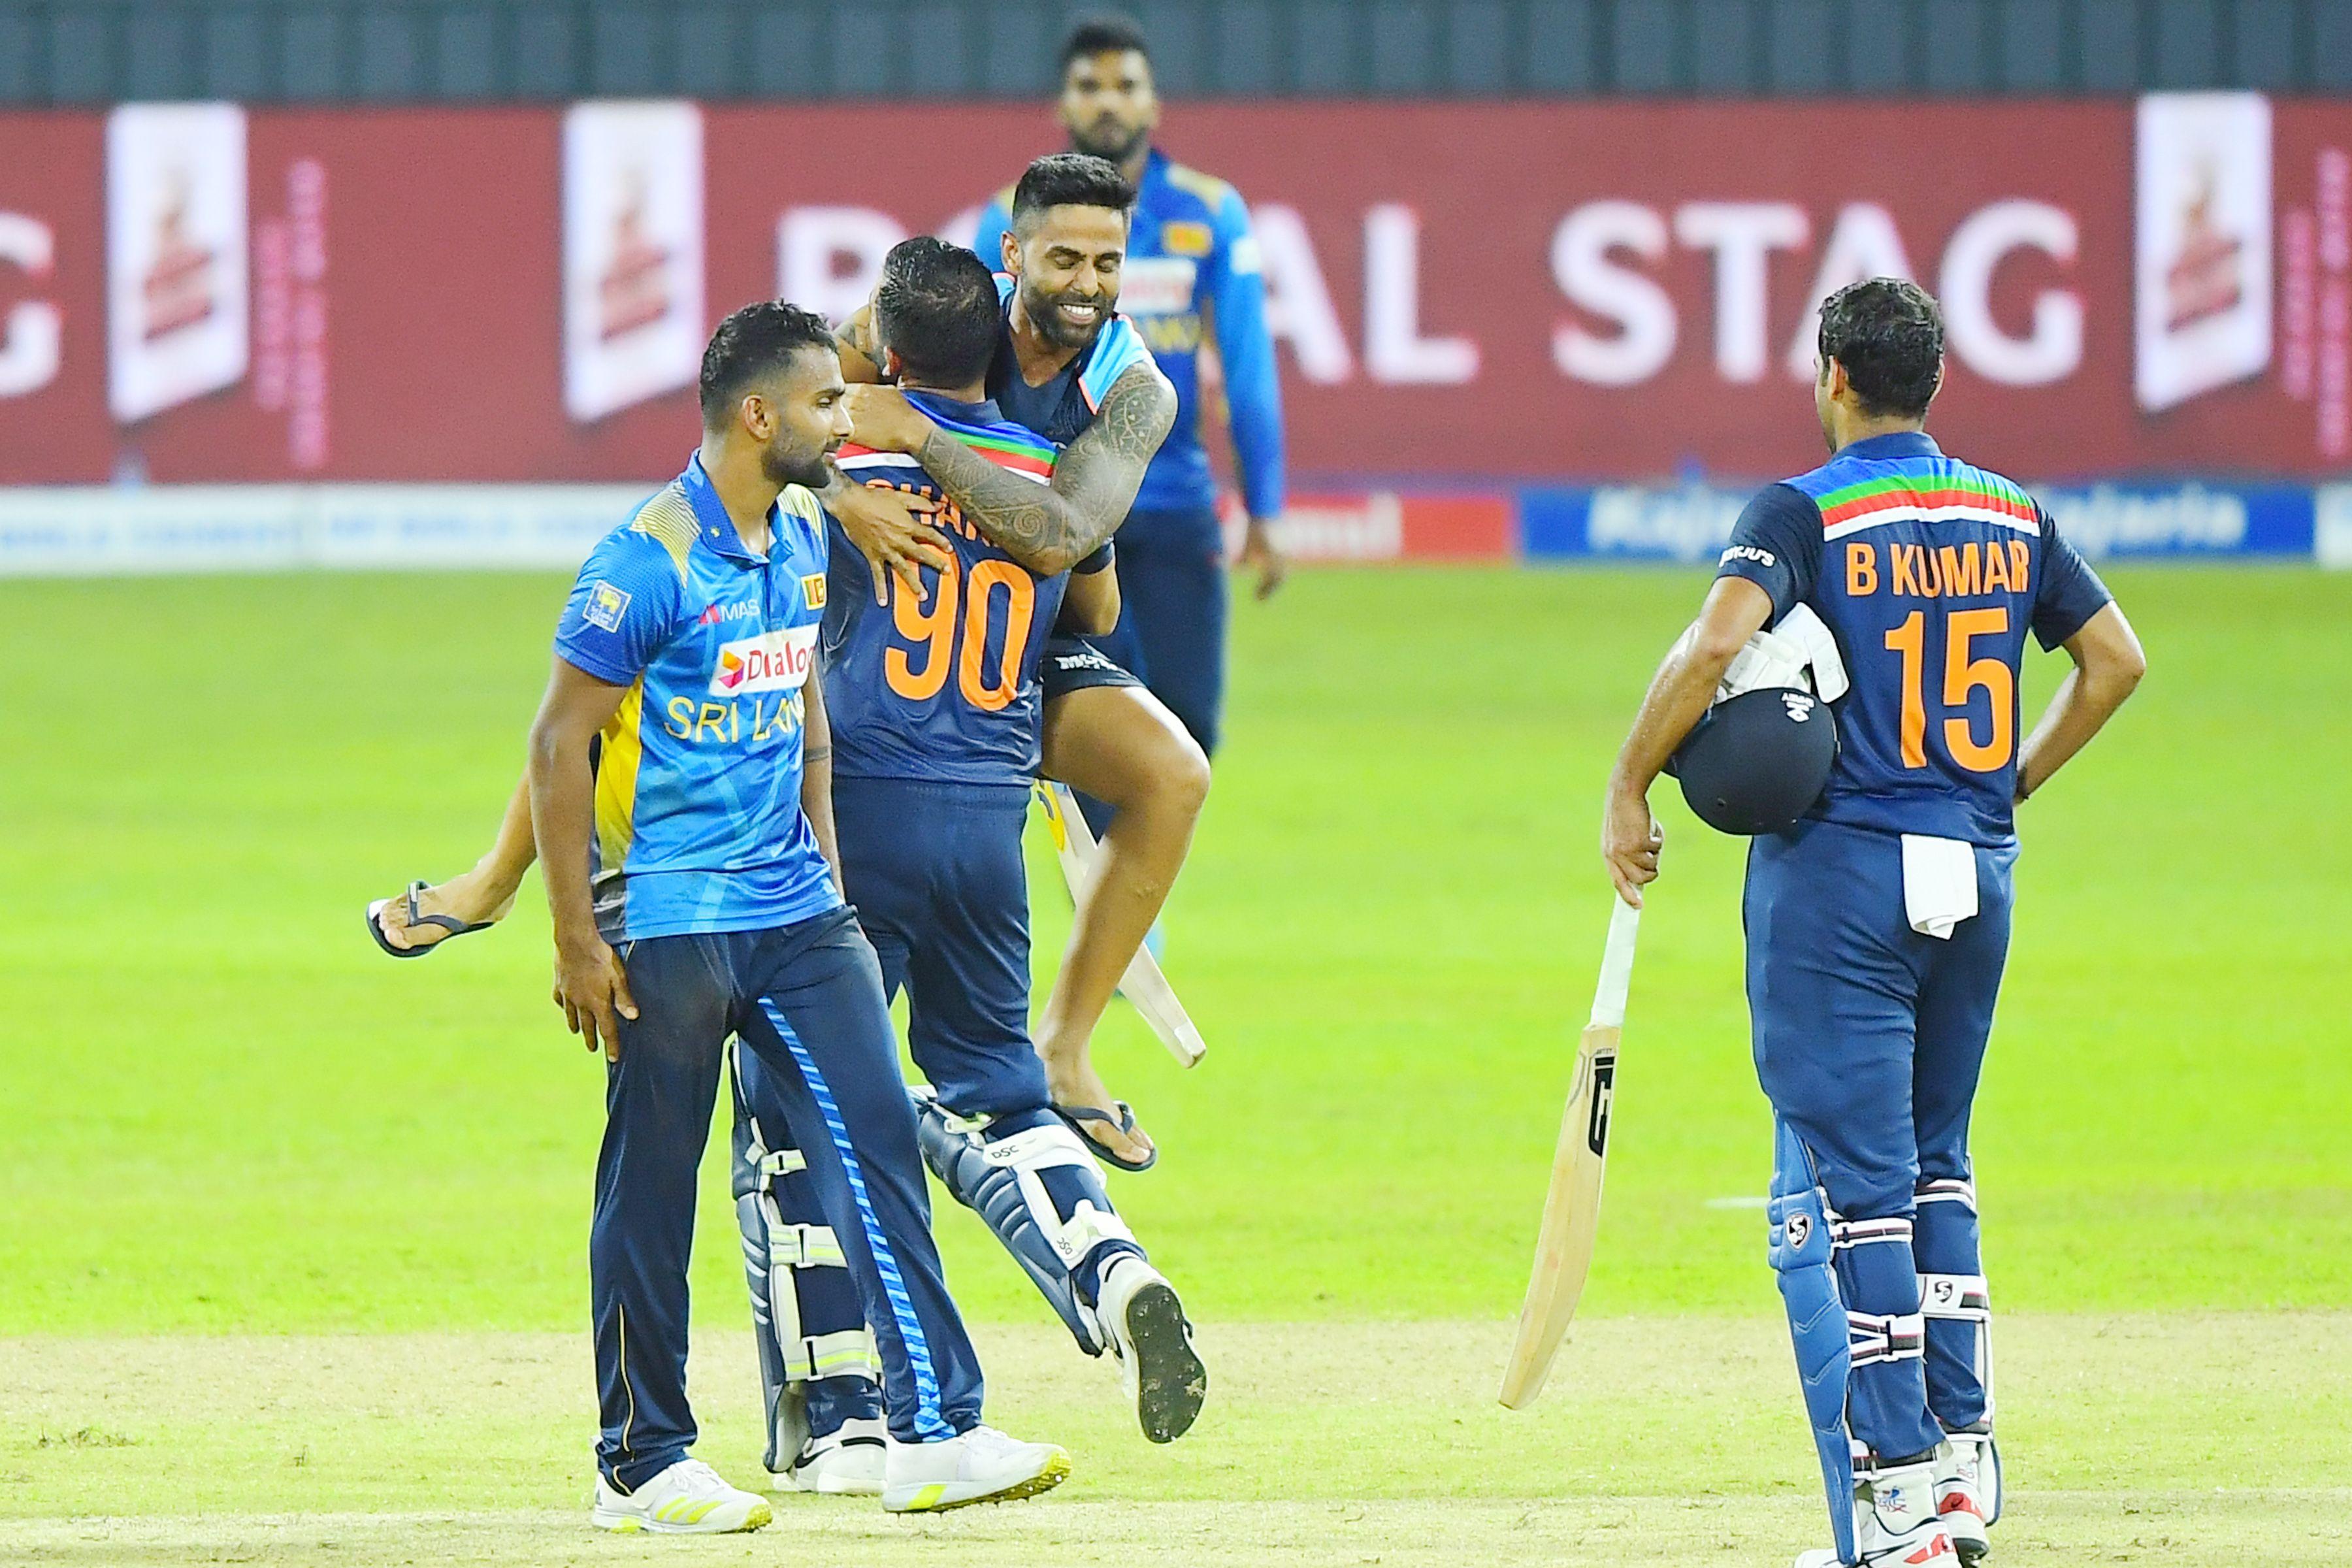 Ind vs SL: Deepak Chahar